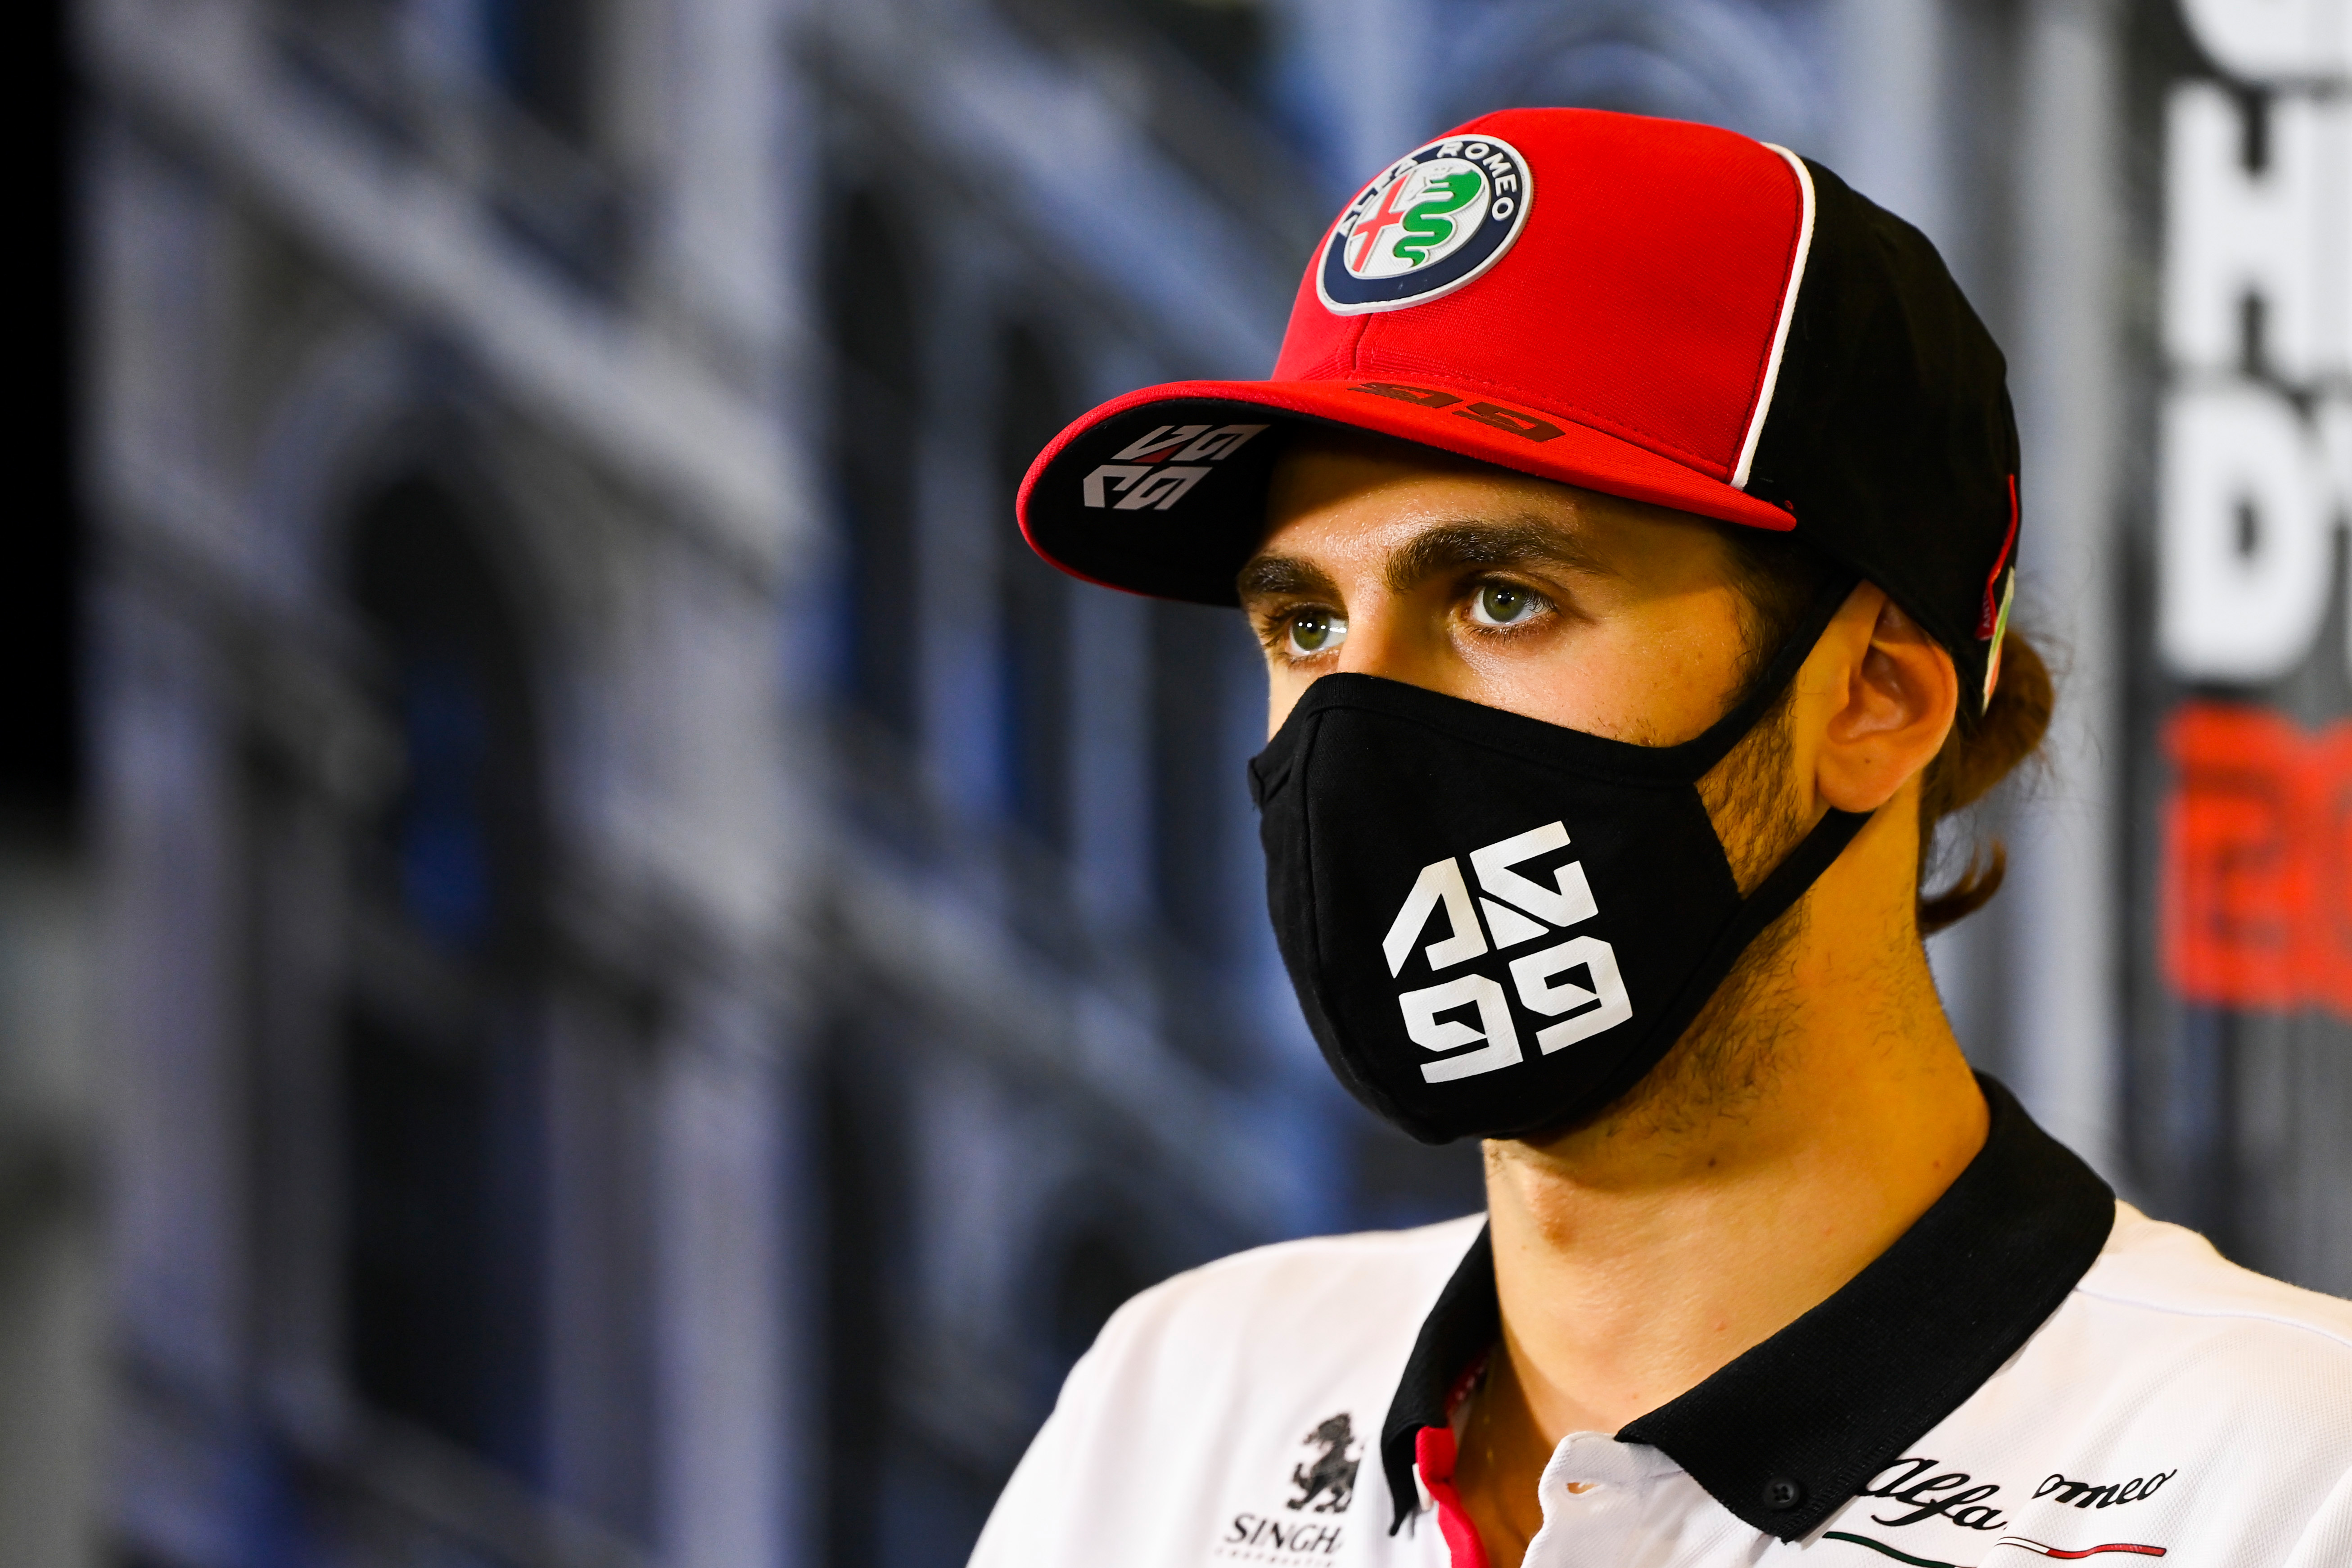 Motor Racing Formula One World Championship Italian Grand Prix Preparation Day Monza, Italy